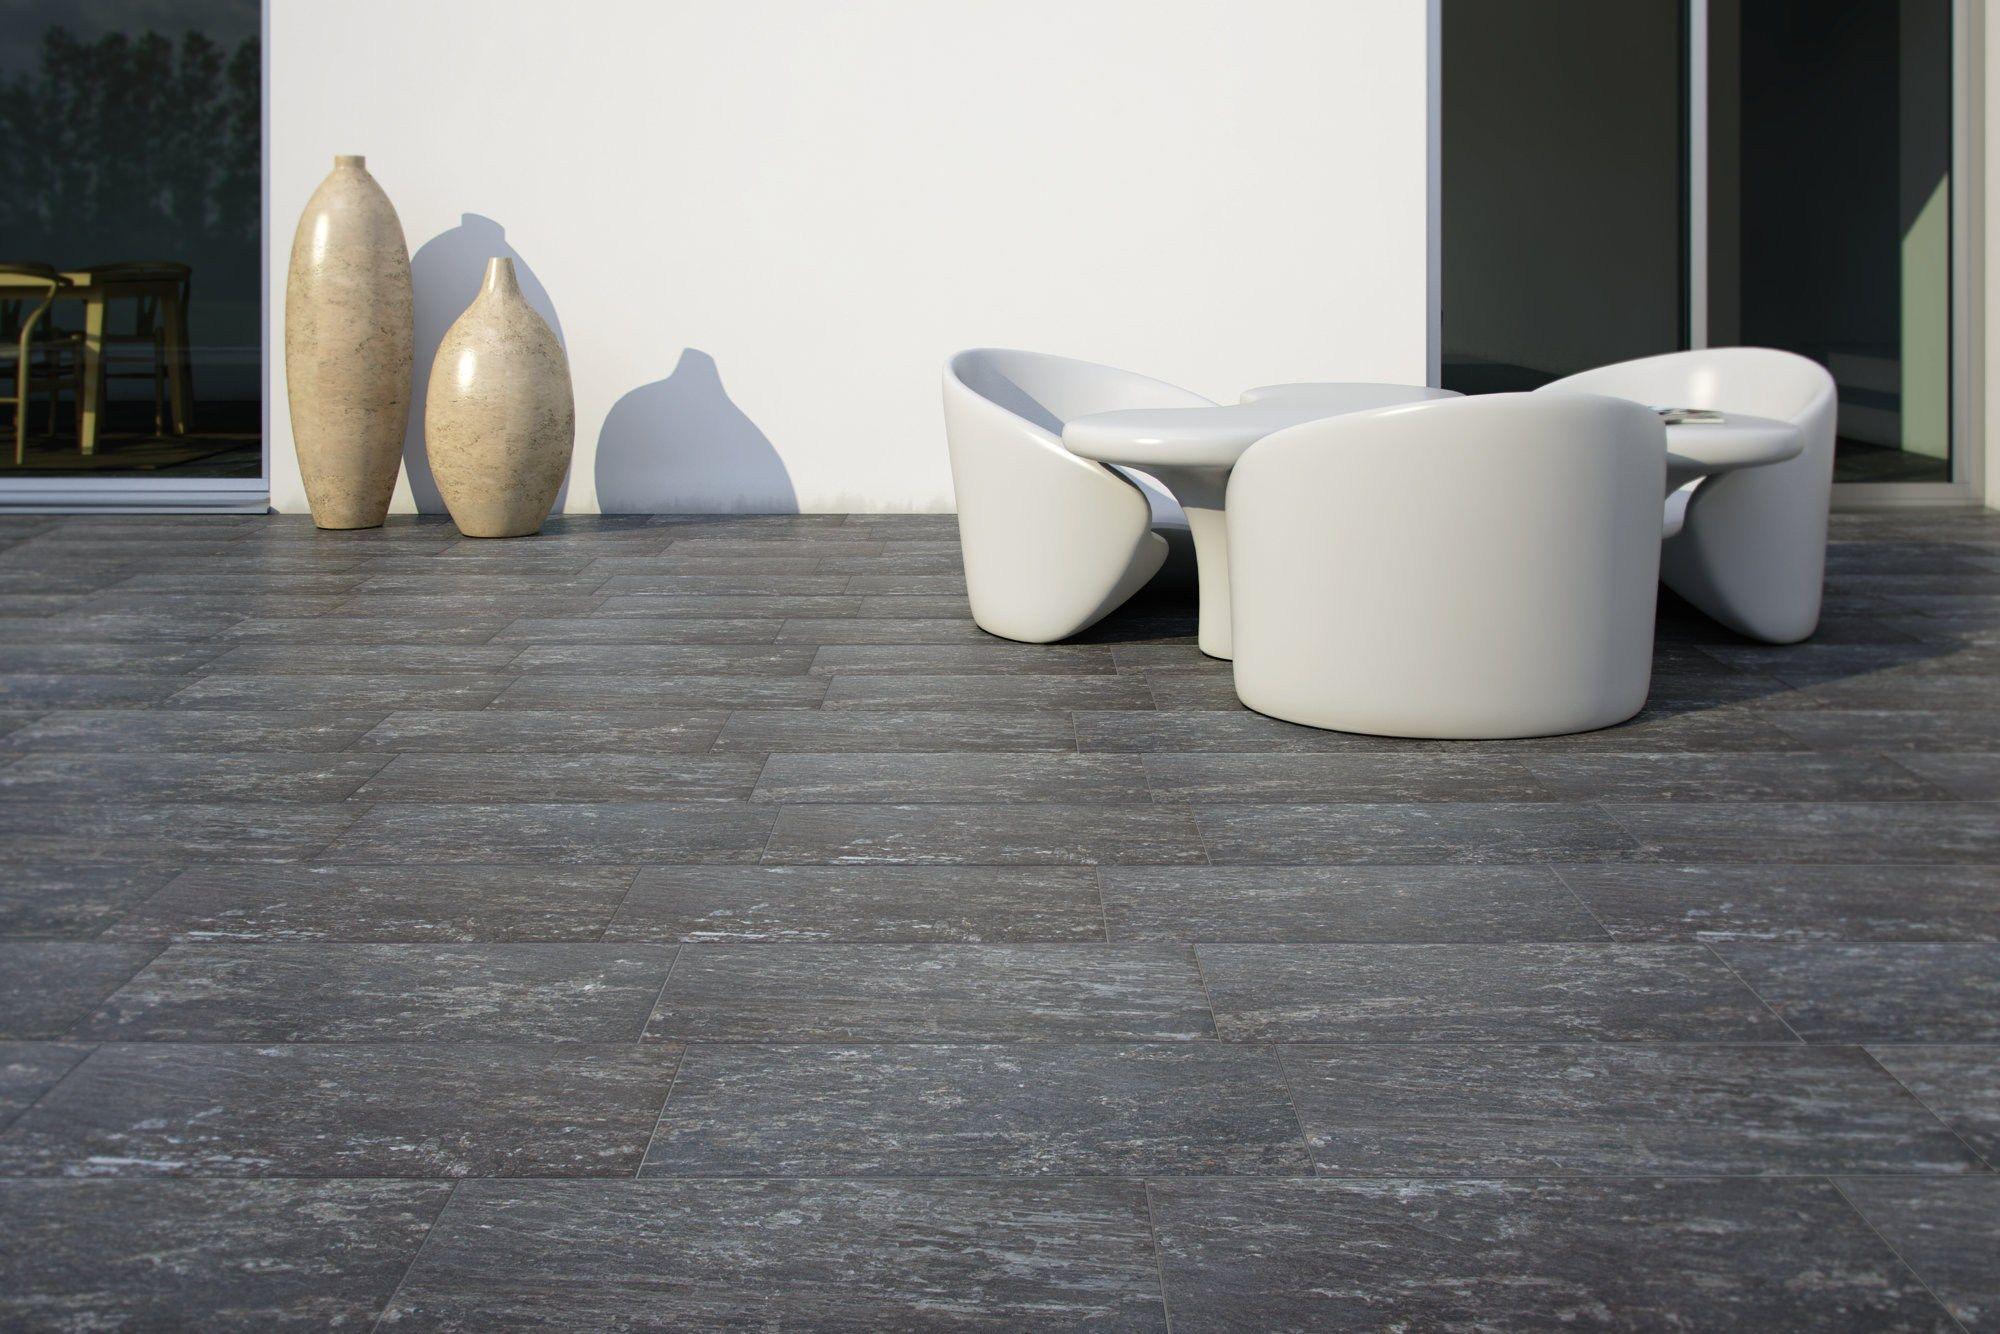 Pavimento per esterni in gres porcellanato effetto pietra wild rock by recer - Gres porcellanato effetto pietra per esterni ...